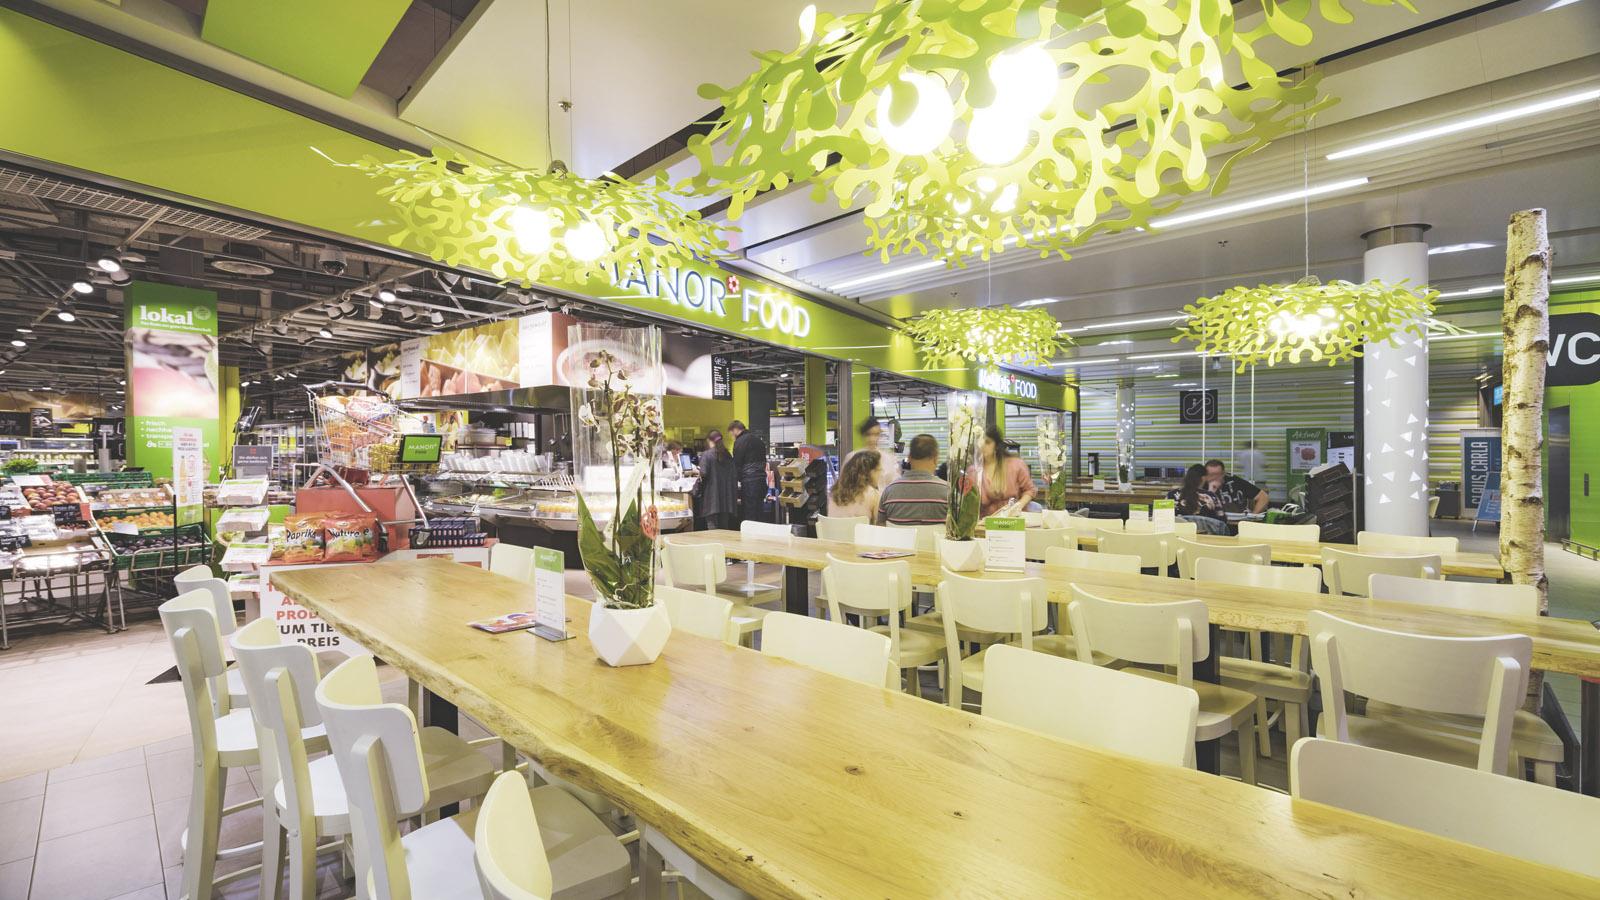 Manor Food im Buecheli Center Liestal